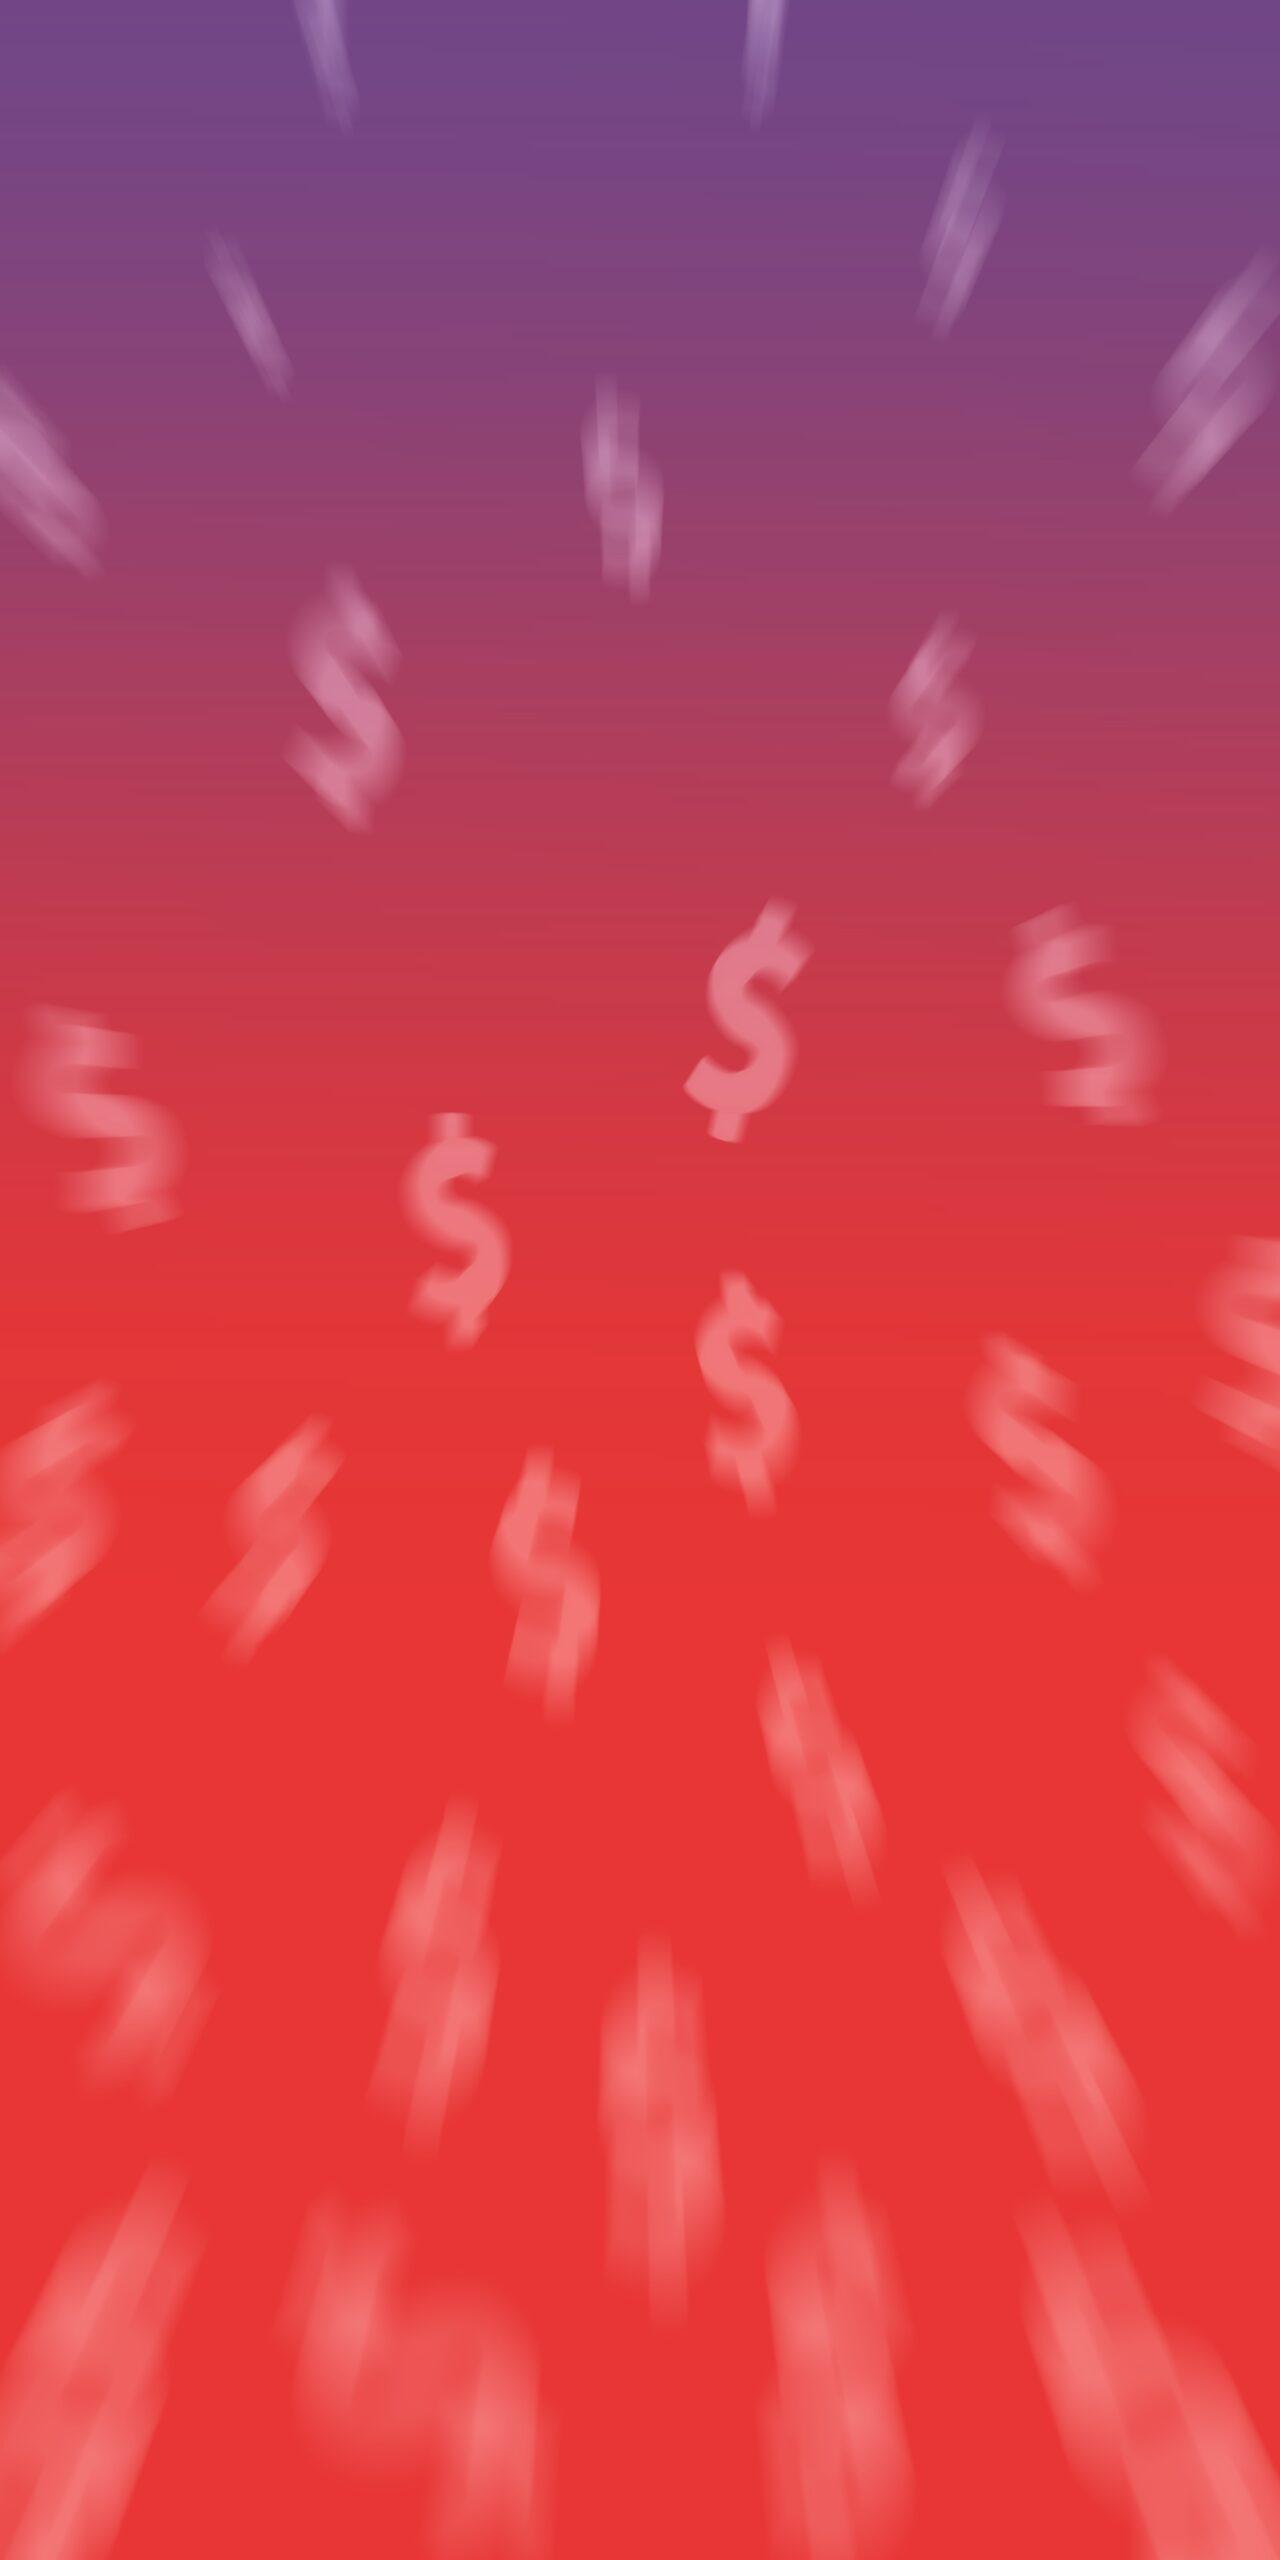 spongebob mr krabs money eyes red background wallpaper